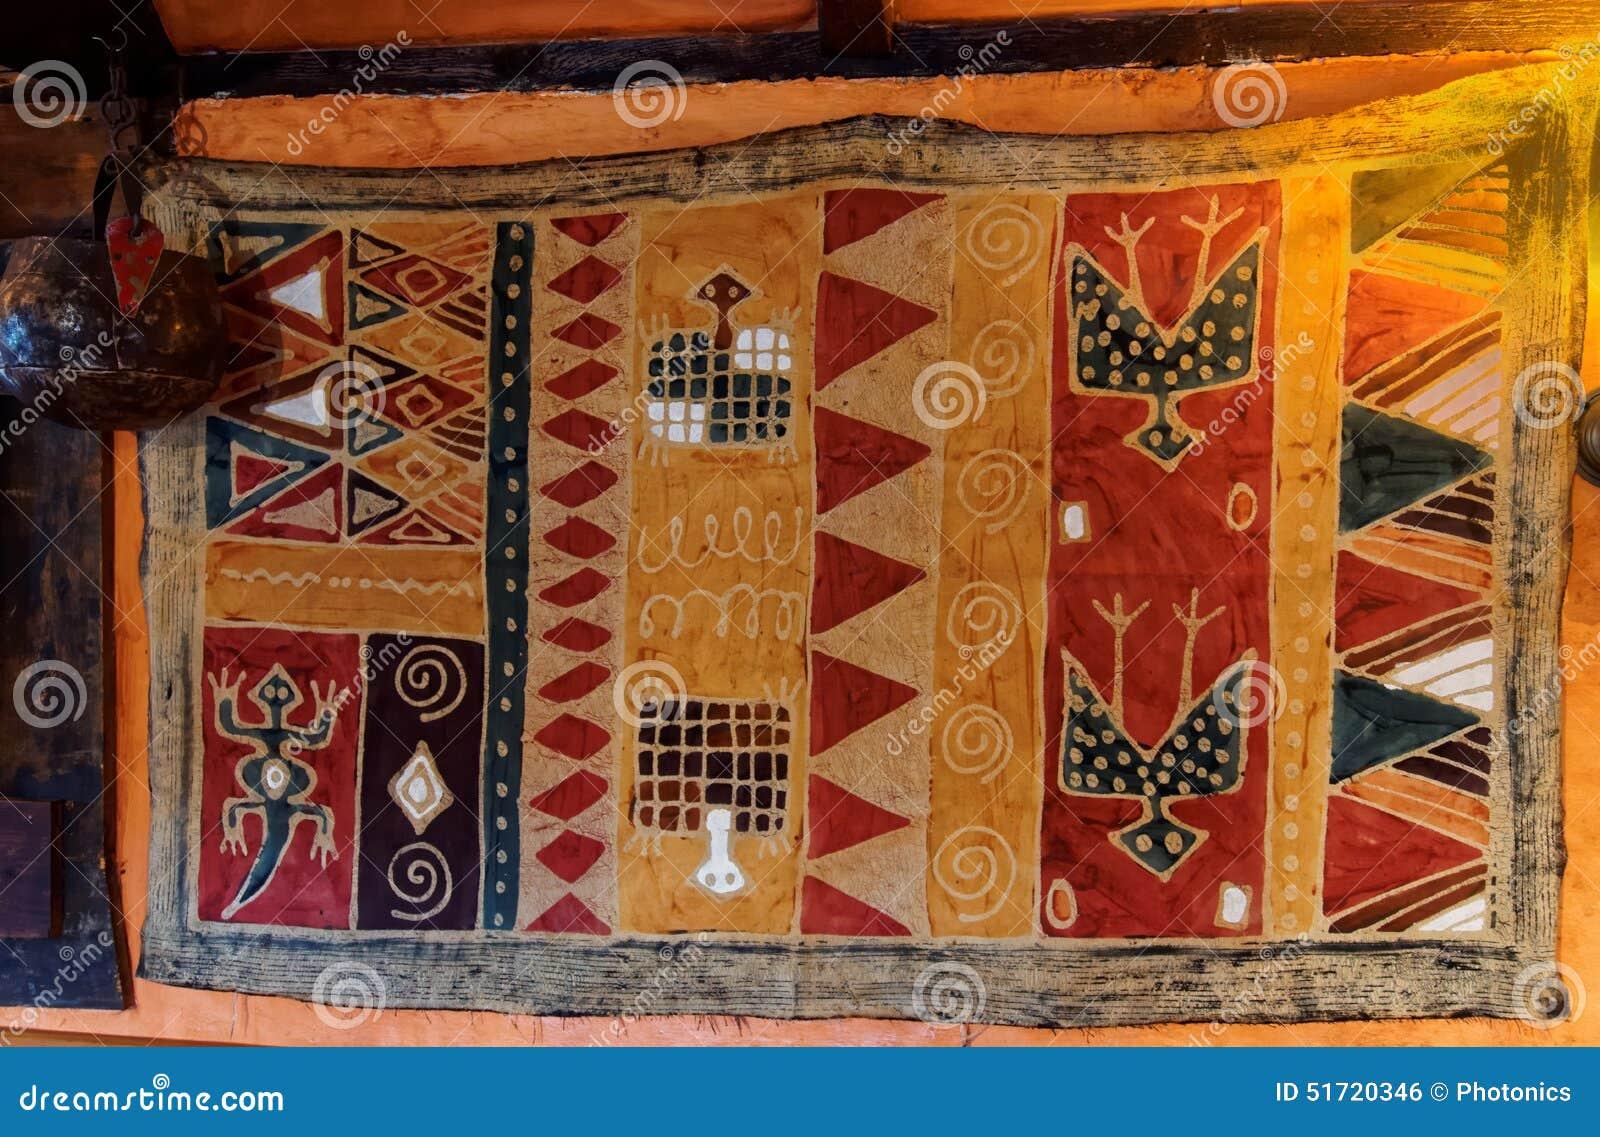 Aboriginal African Hut Rug ...